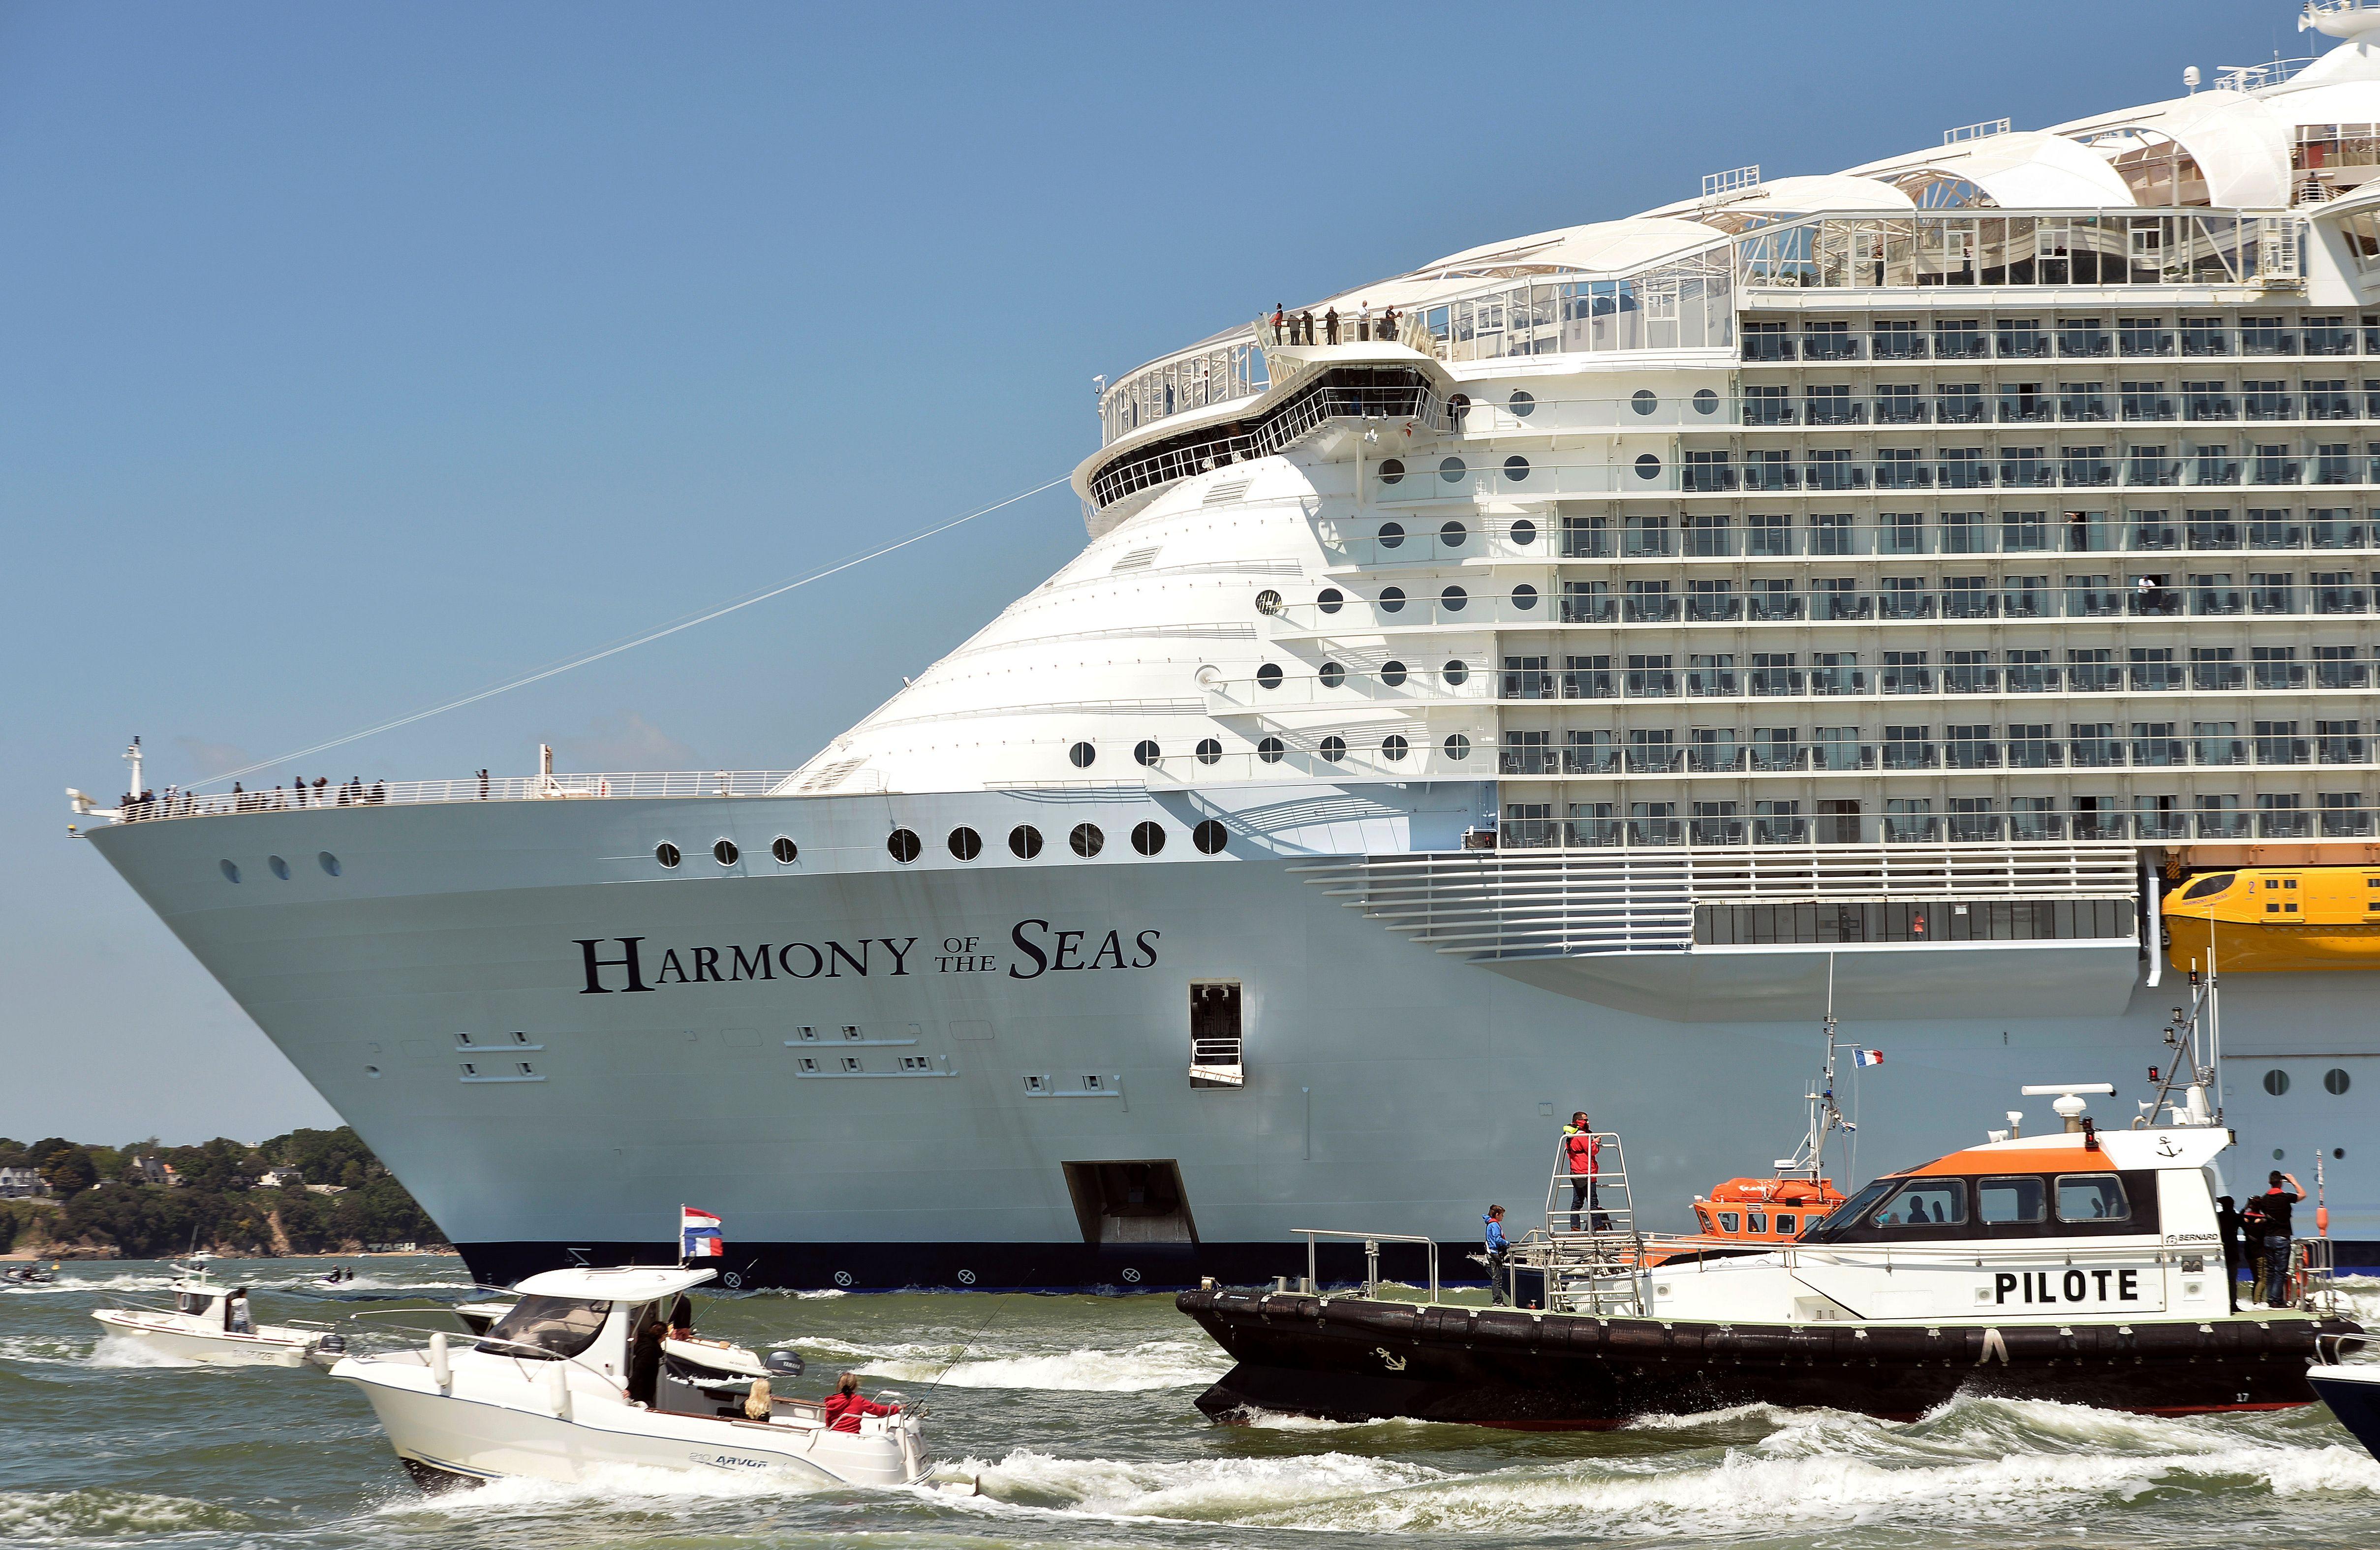 Harmony of the Seas largest cruise ship